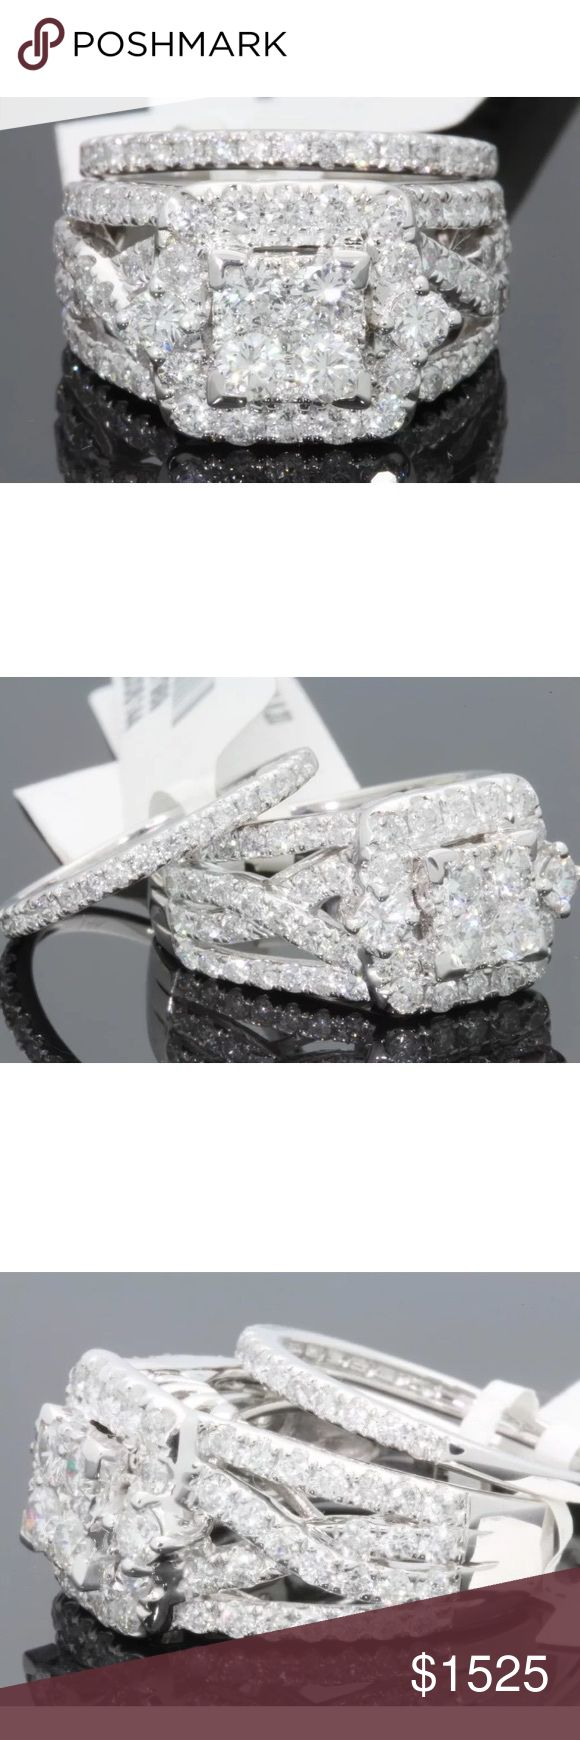 3.05 carat 10k white gold diamond ring set 3.05 carat 10k white gold diamond ring set! High quality diamonds! Lots of sparkle! Retail over $7000!!! Jewelry Rings